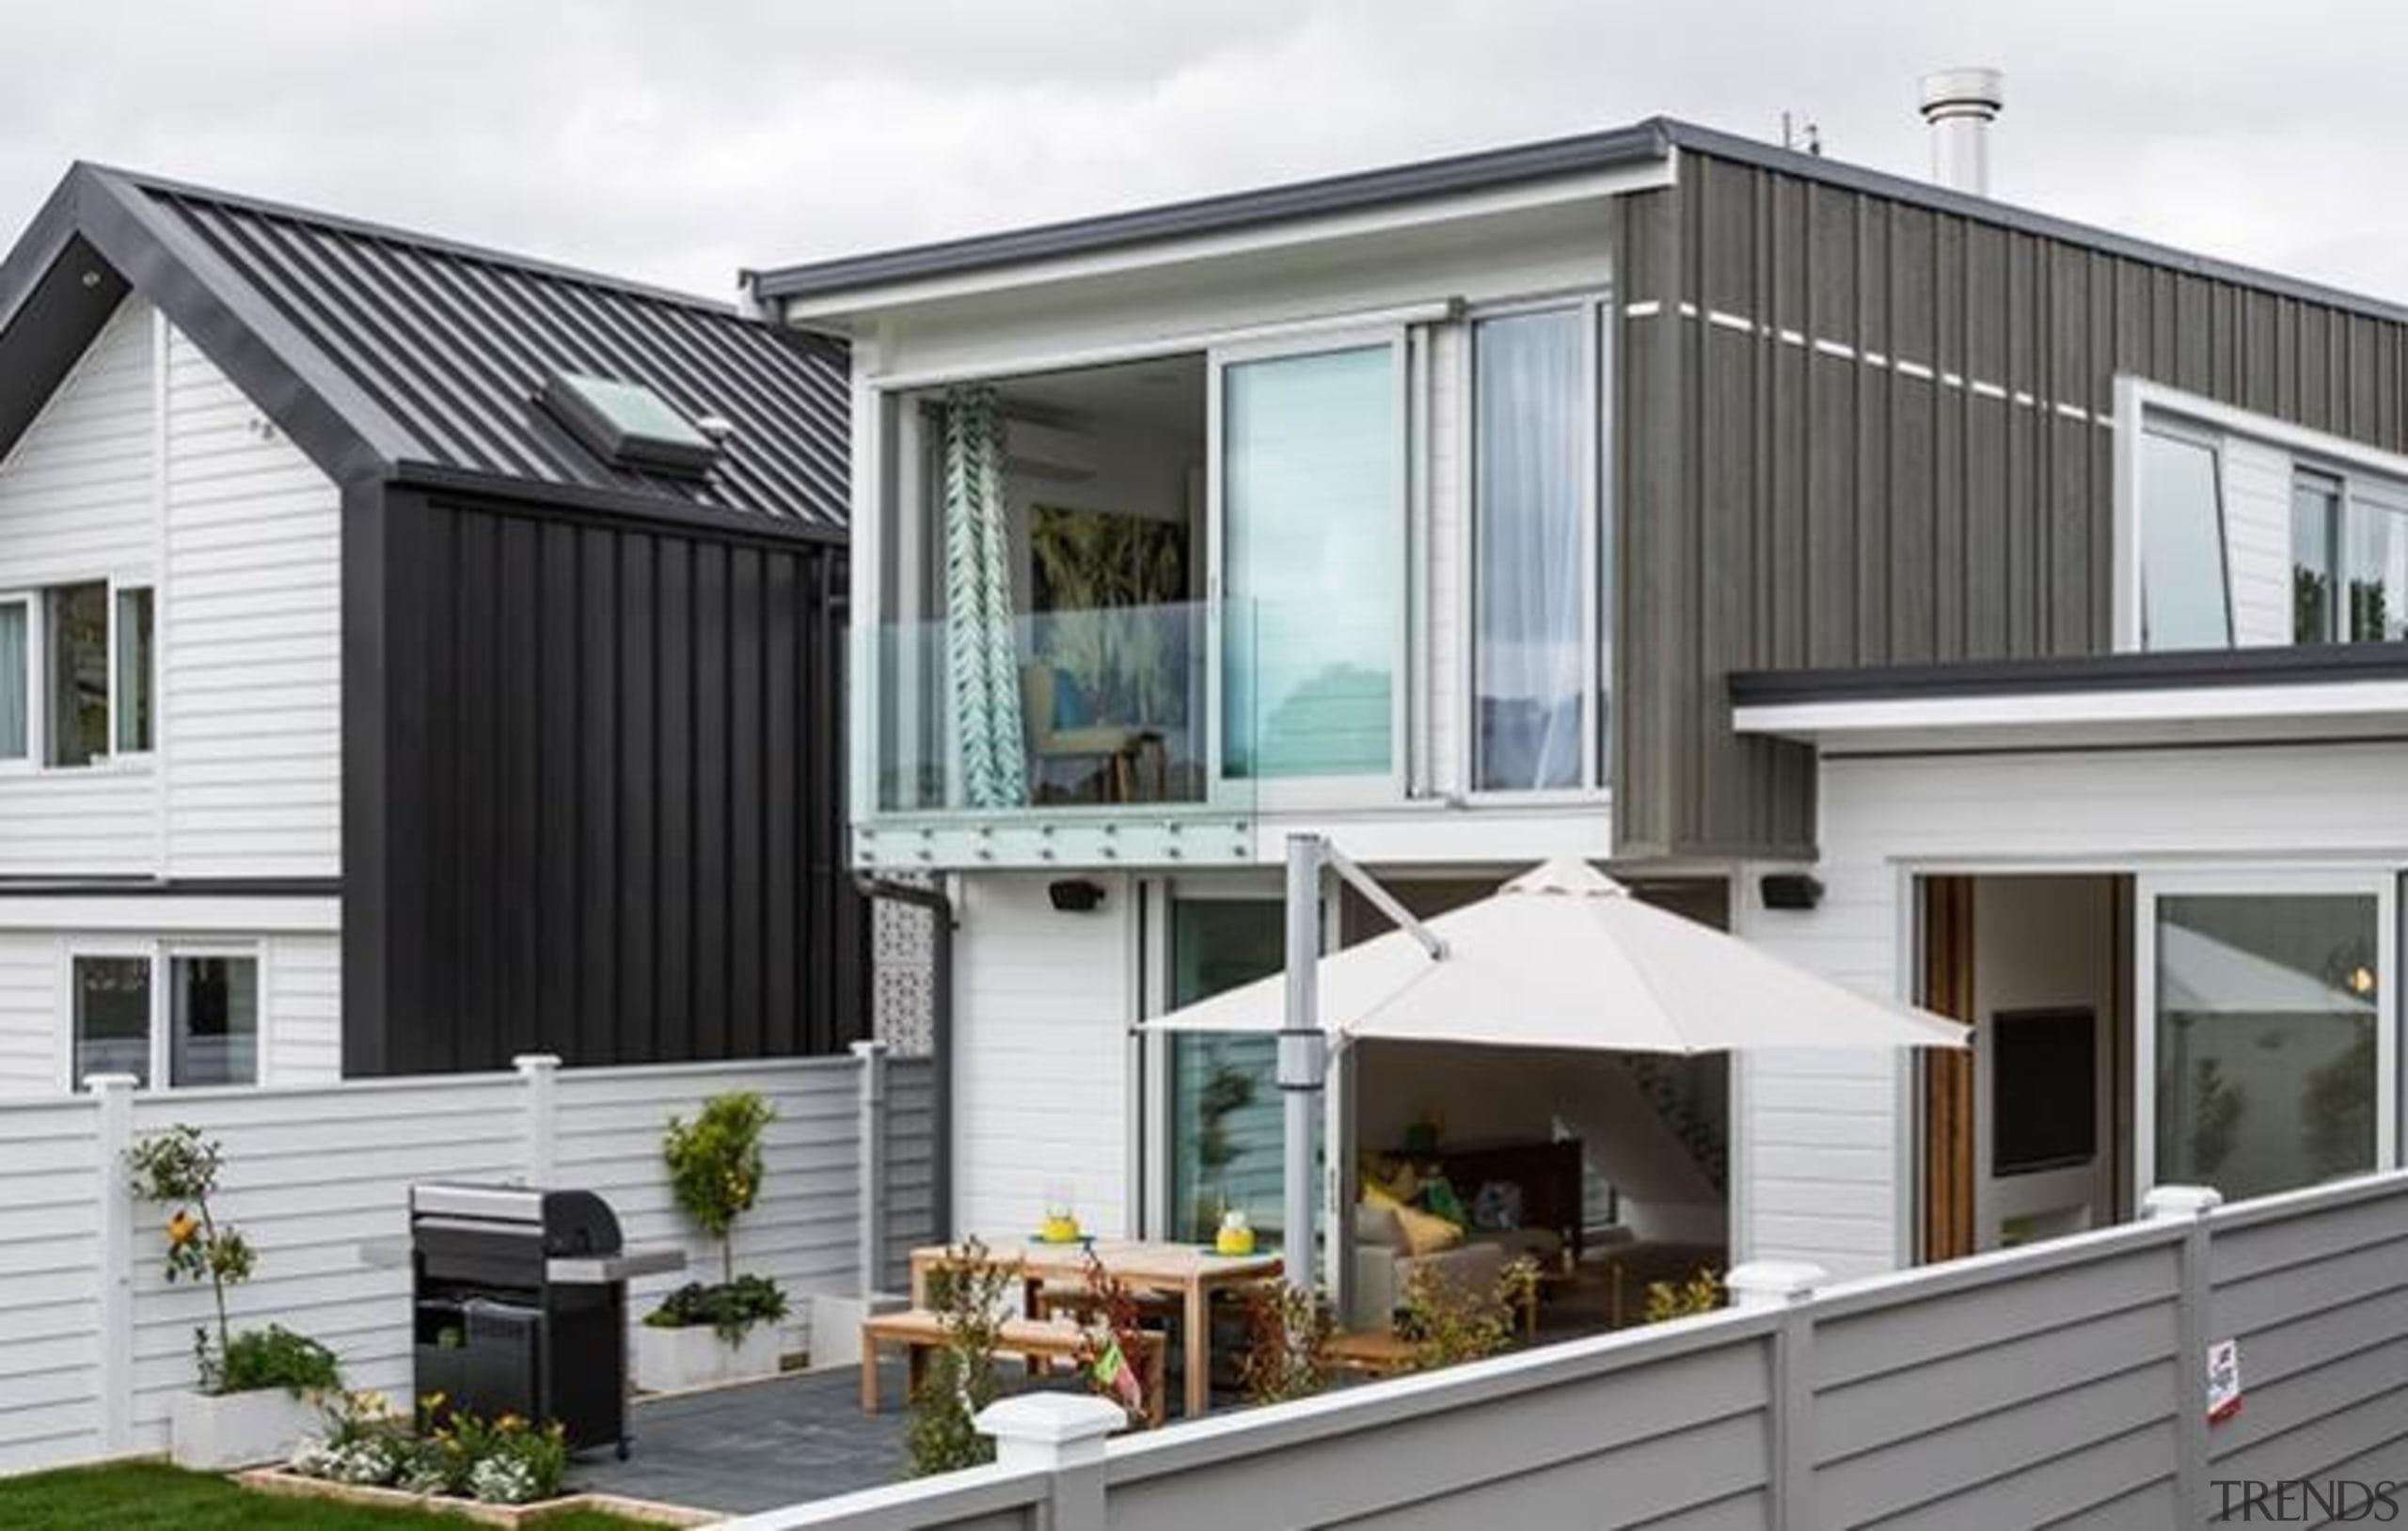 A-lign Concealed Fix 03 - A-lign Concealed Fix elevation, facade, home, house, property, real estate, residential area, siding, window, gray, white